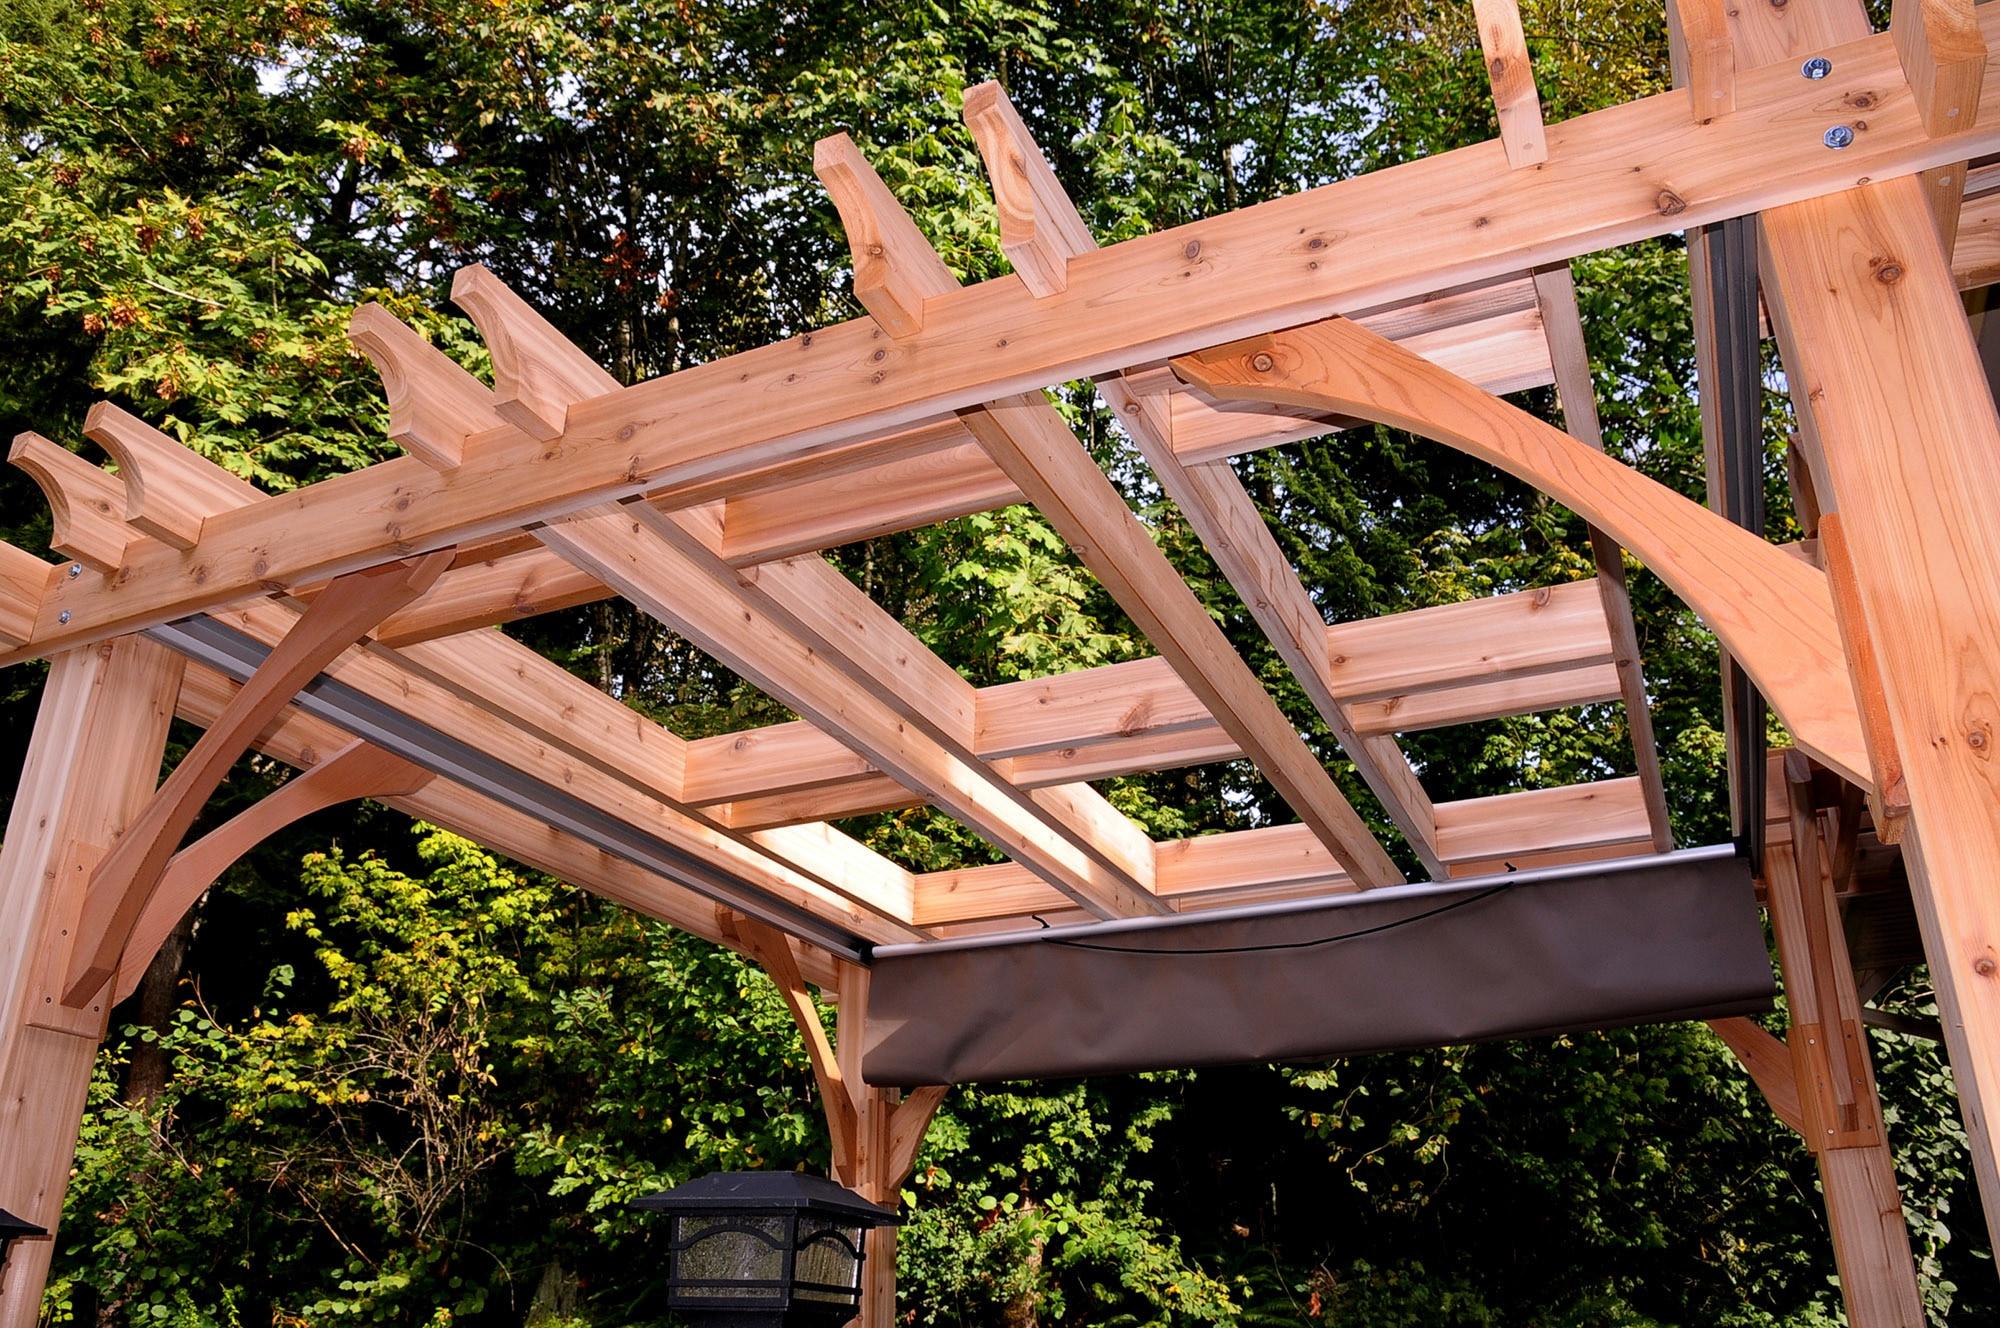 10103807 kontiki wooden pergolas 8x8 spa breeze for Wooden pergola with shade